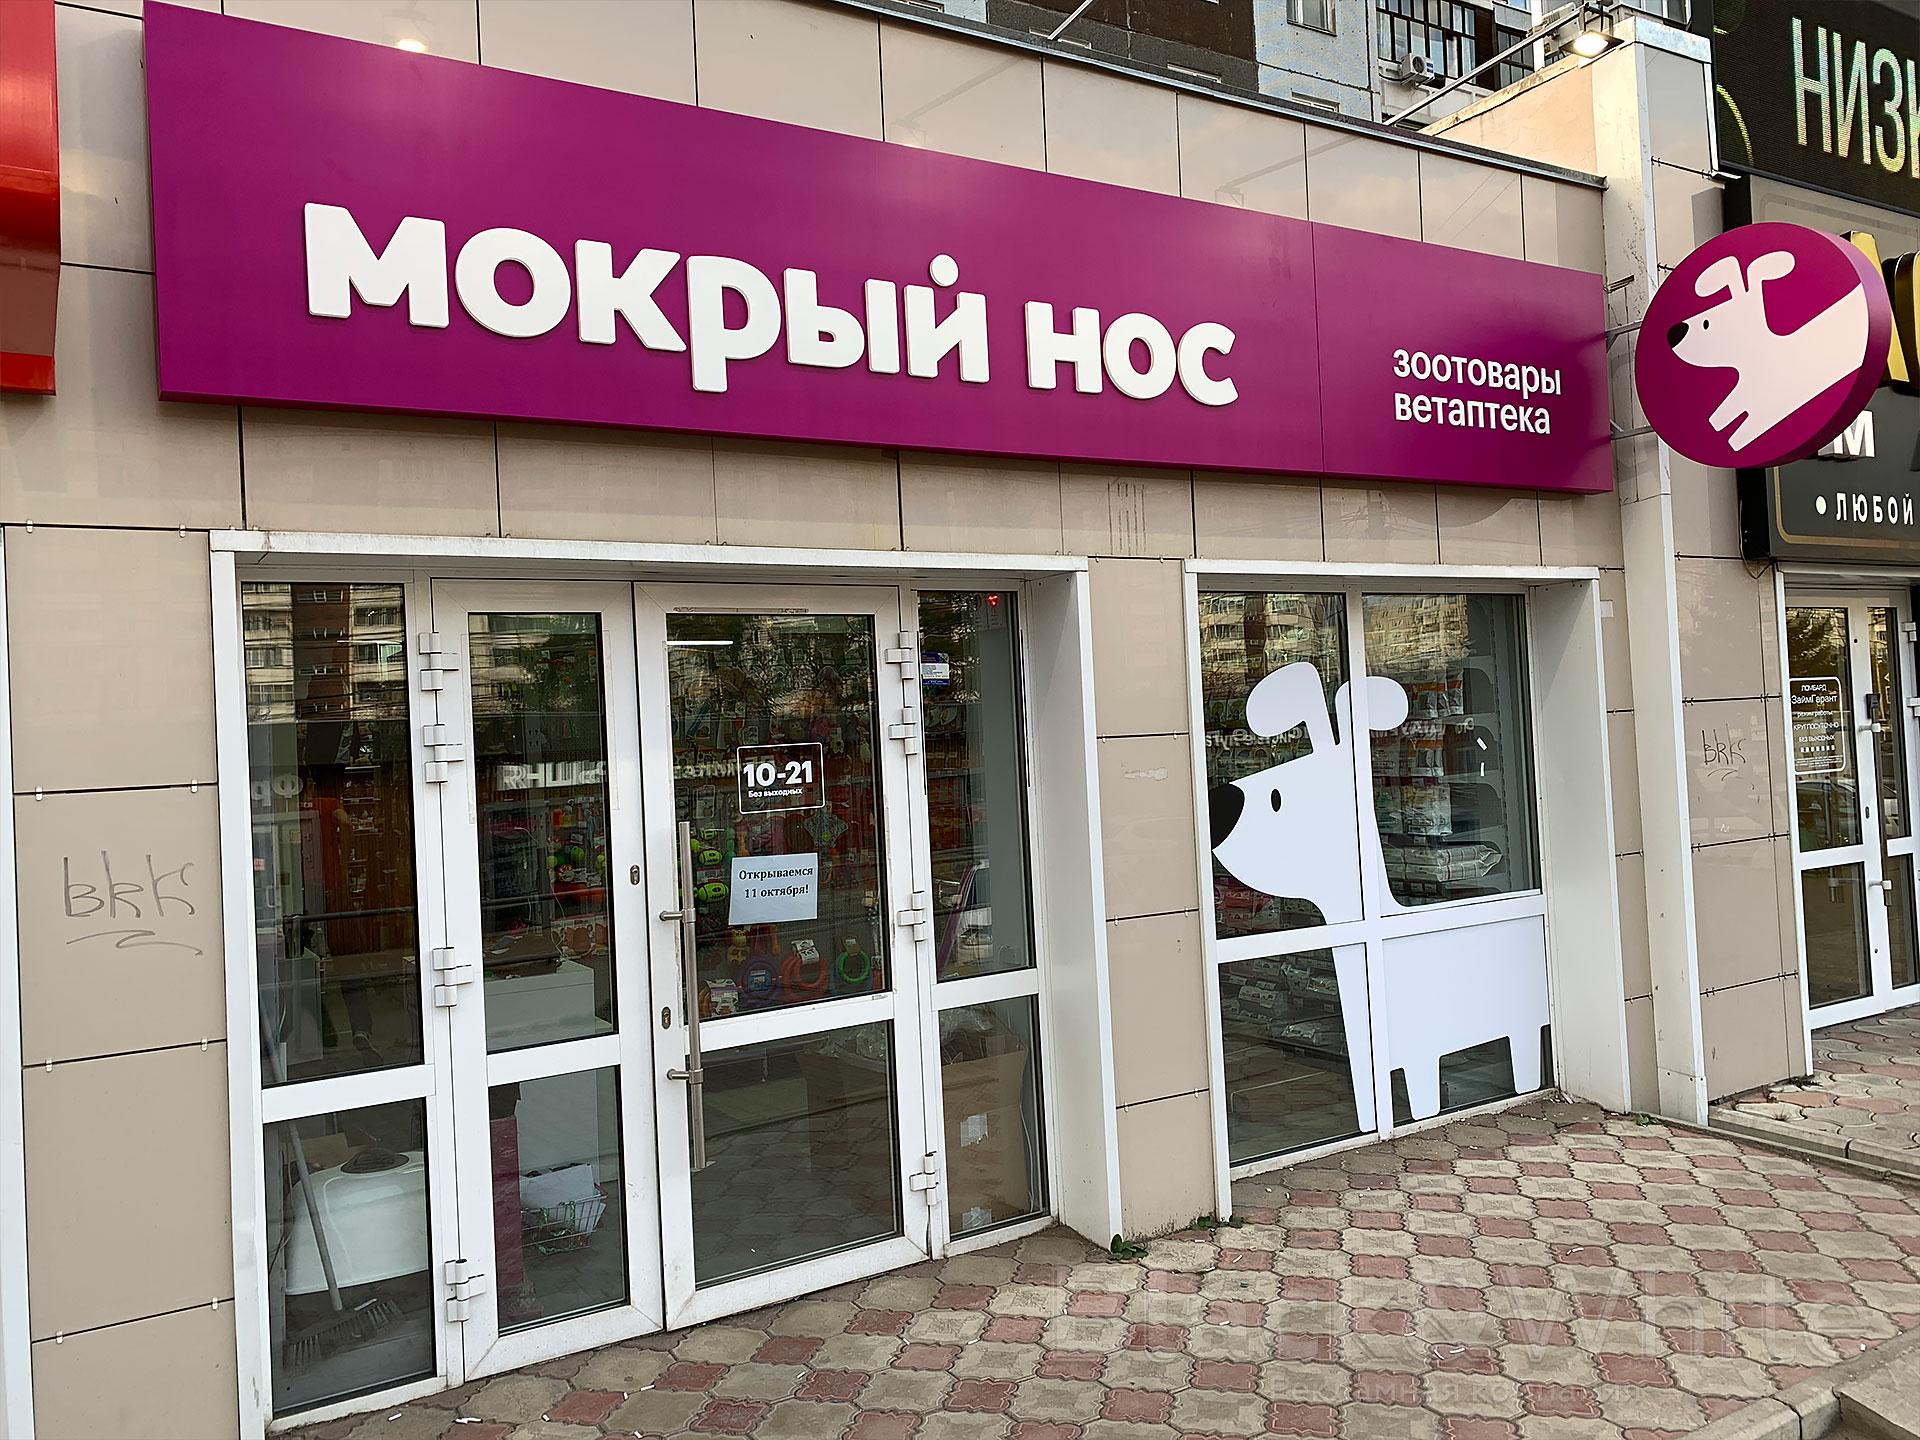 Композитный-короб-с-инкрустацией-Мокрый-нос..jpg